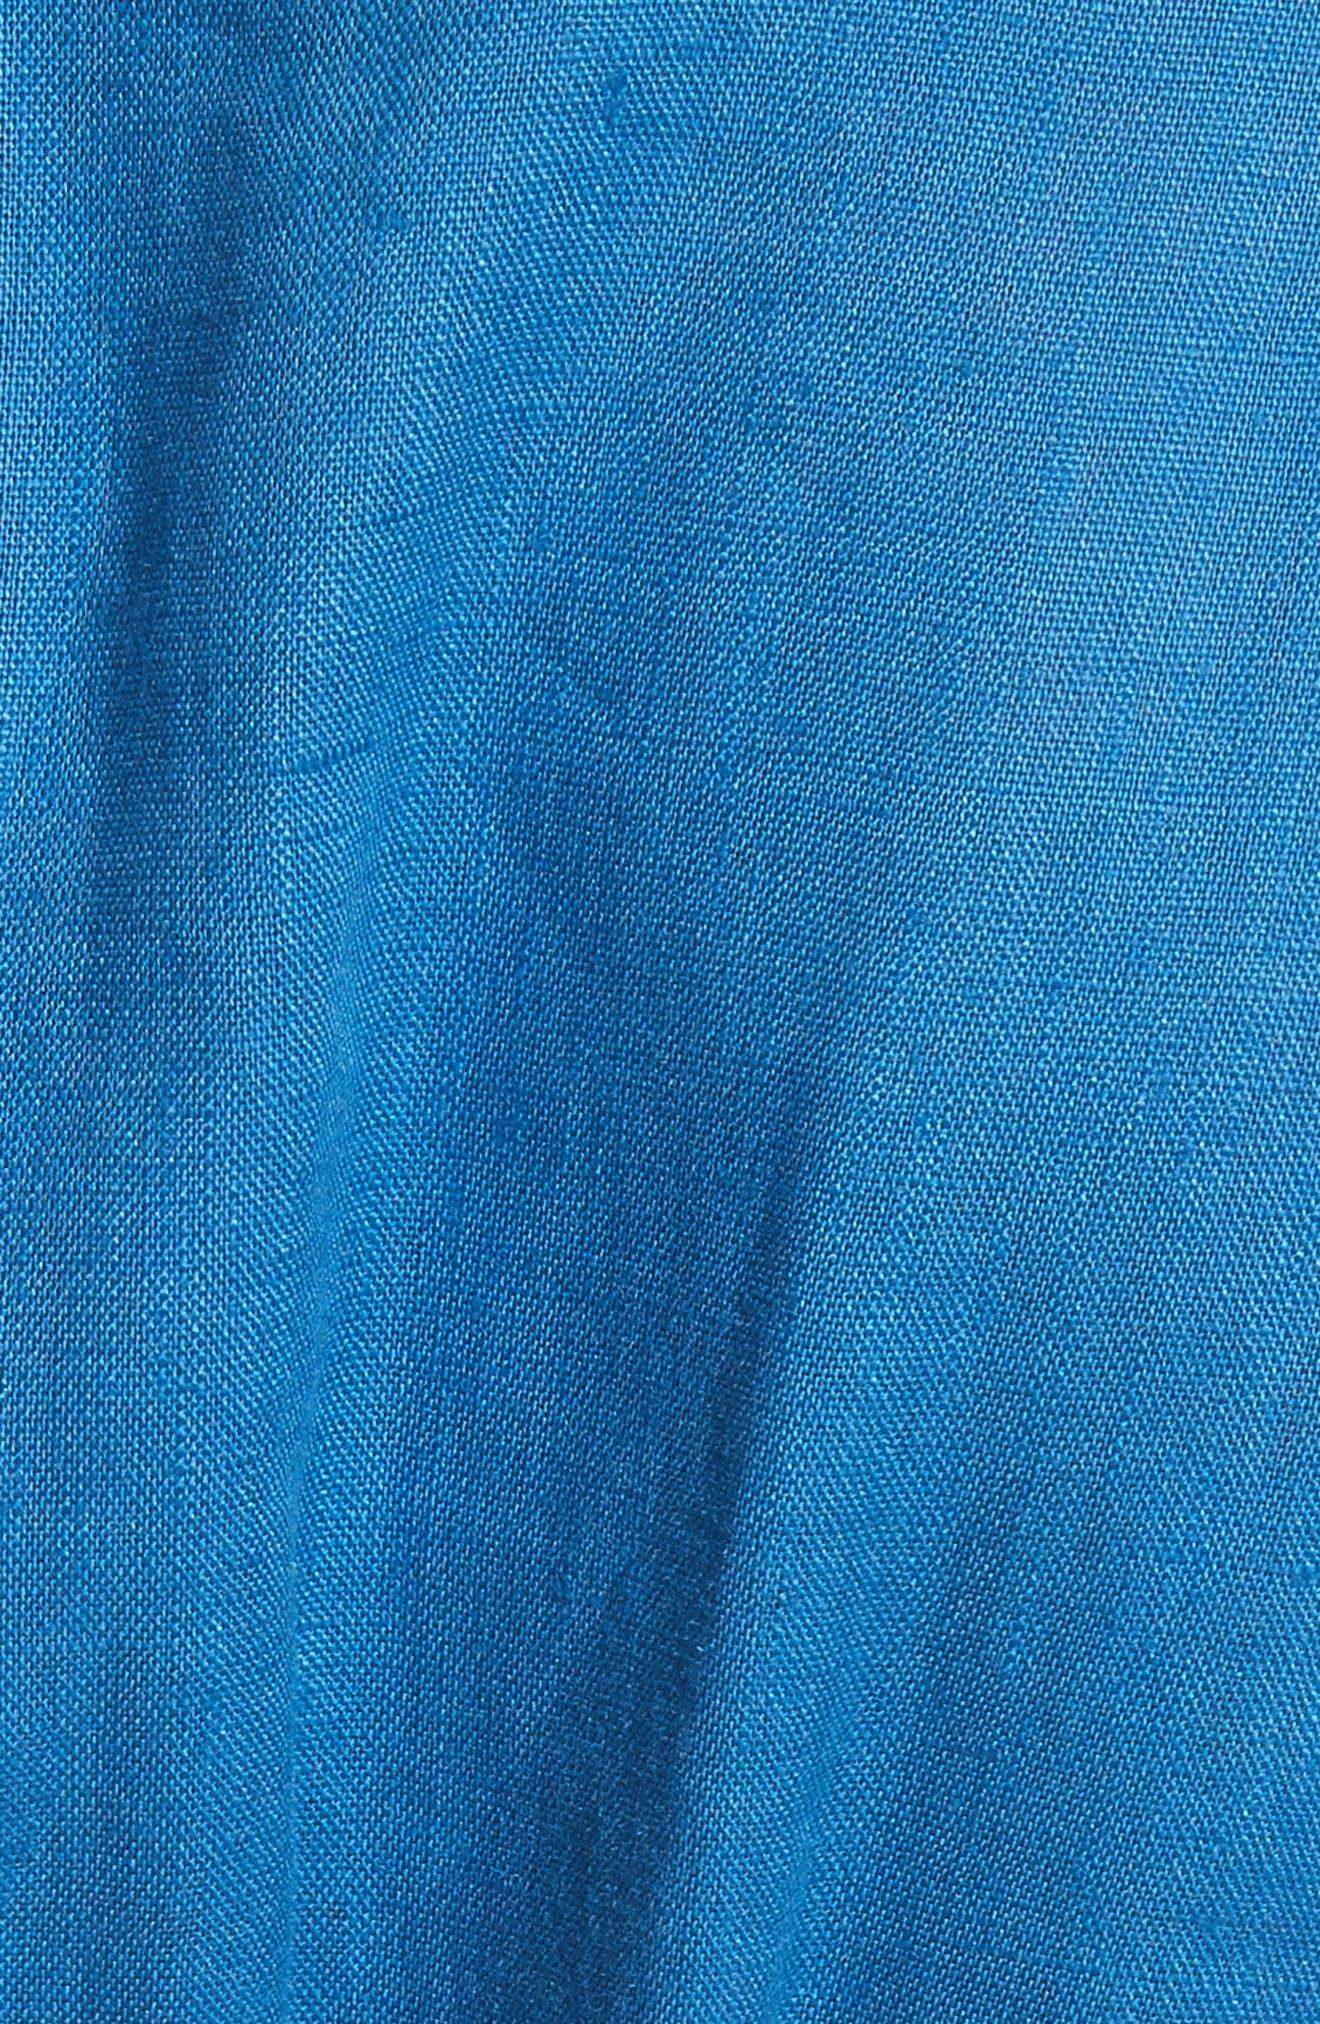 Coraline Pleated Button Front Linen Dress,                             Alternate thumbnail 5, color,                             400